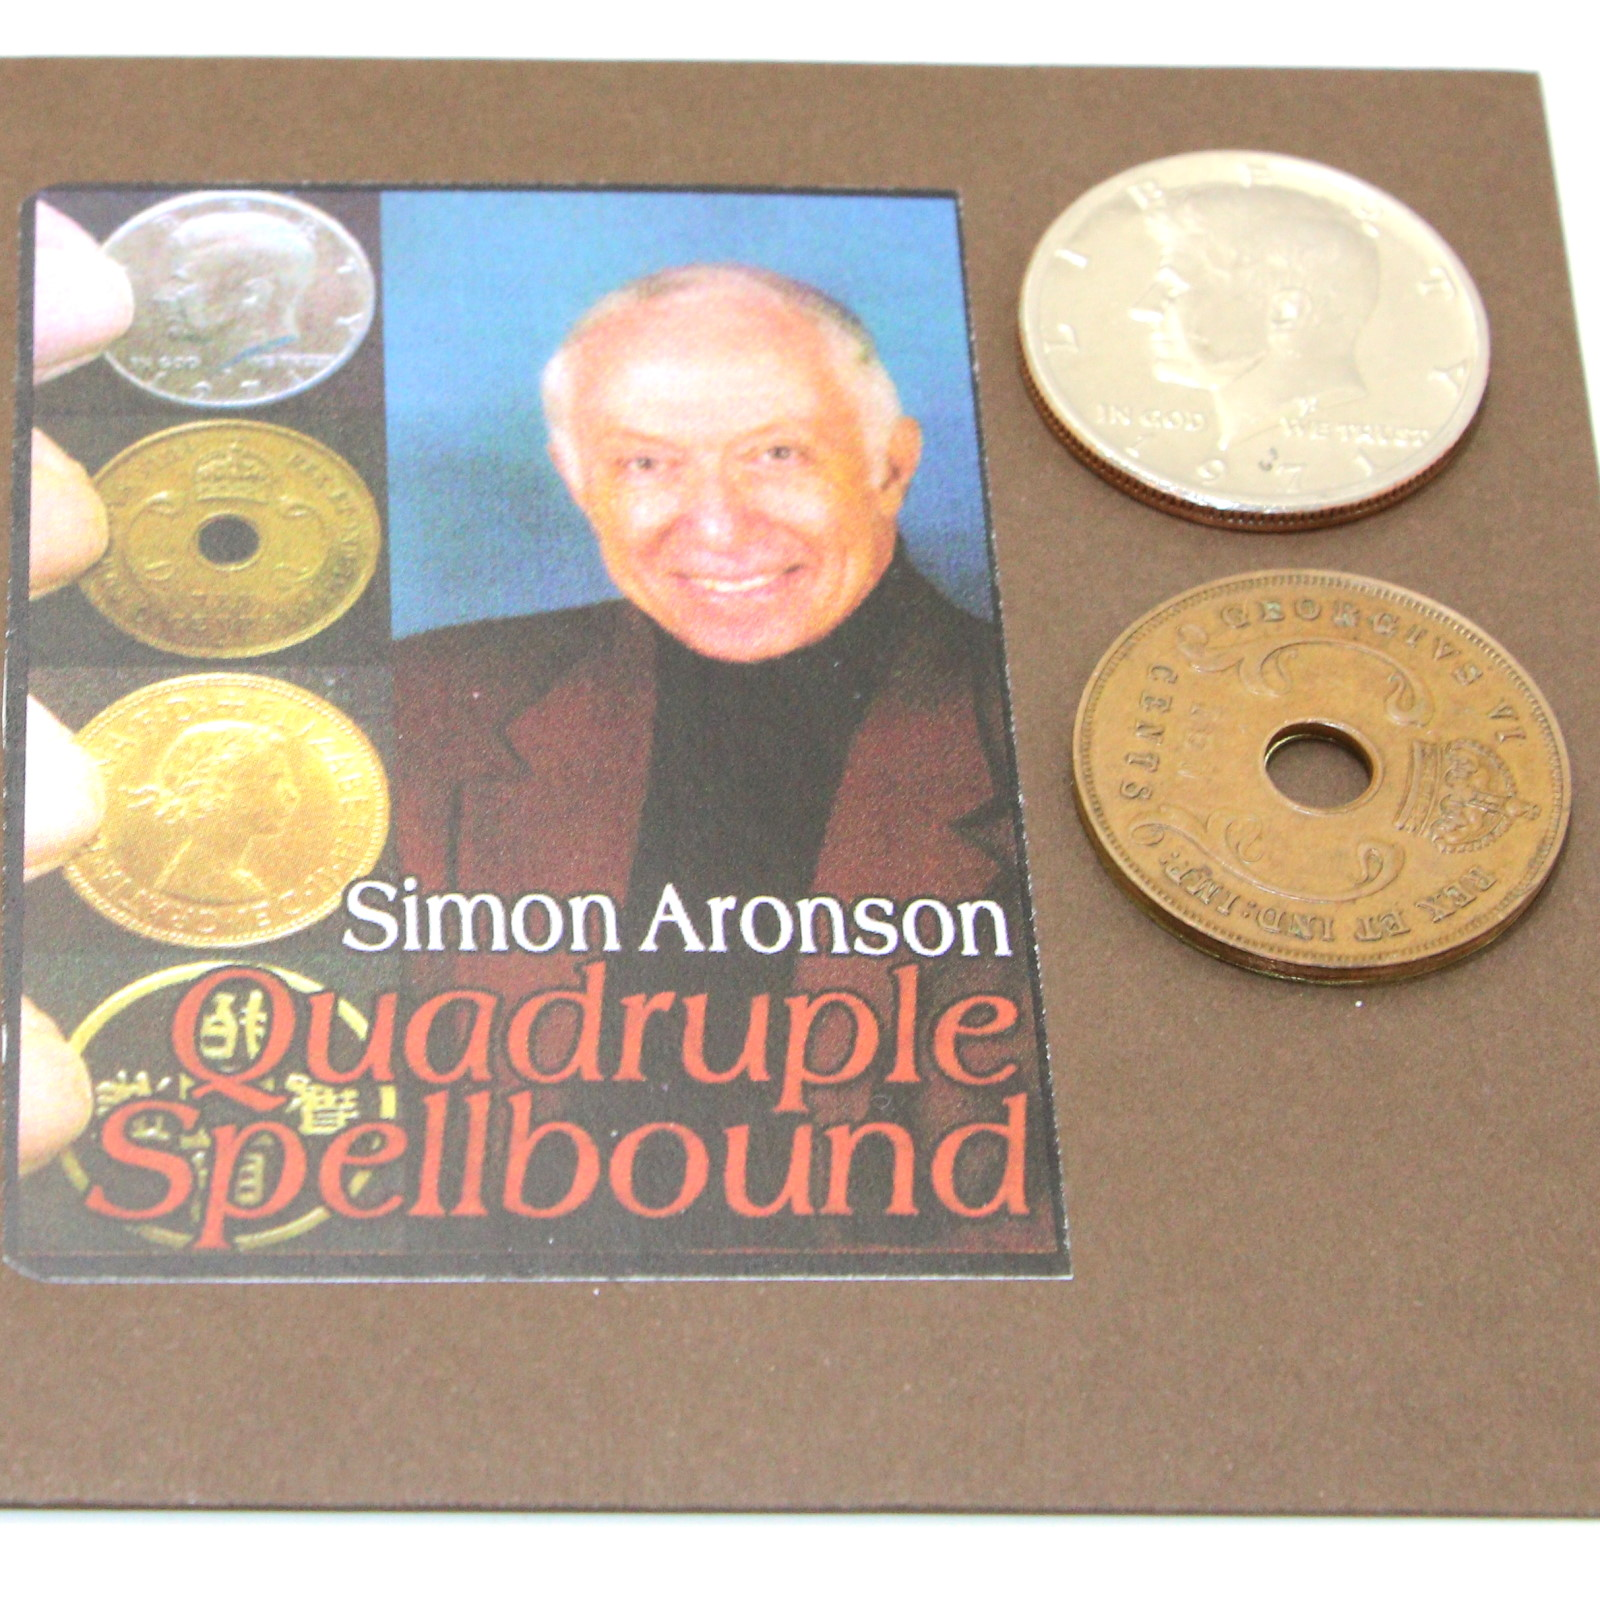 Quadruple Spellbound by Simon Aronson